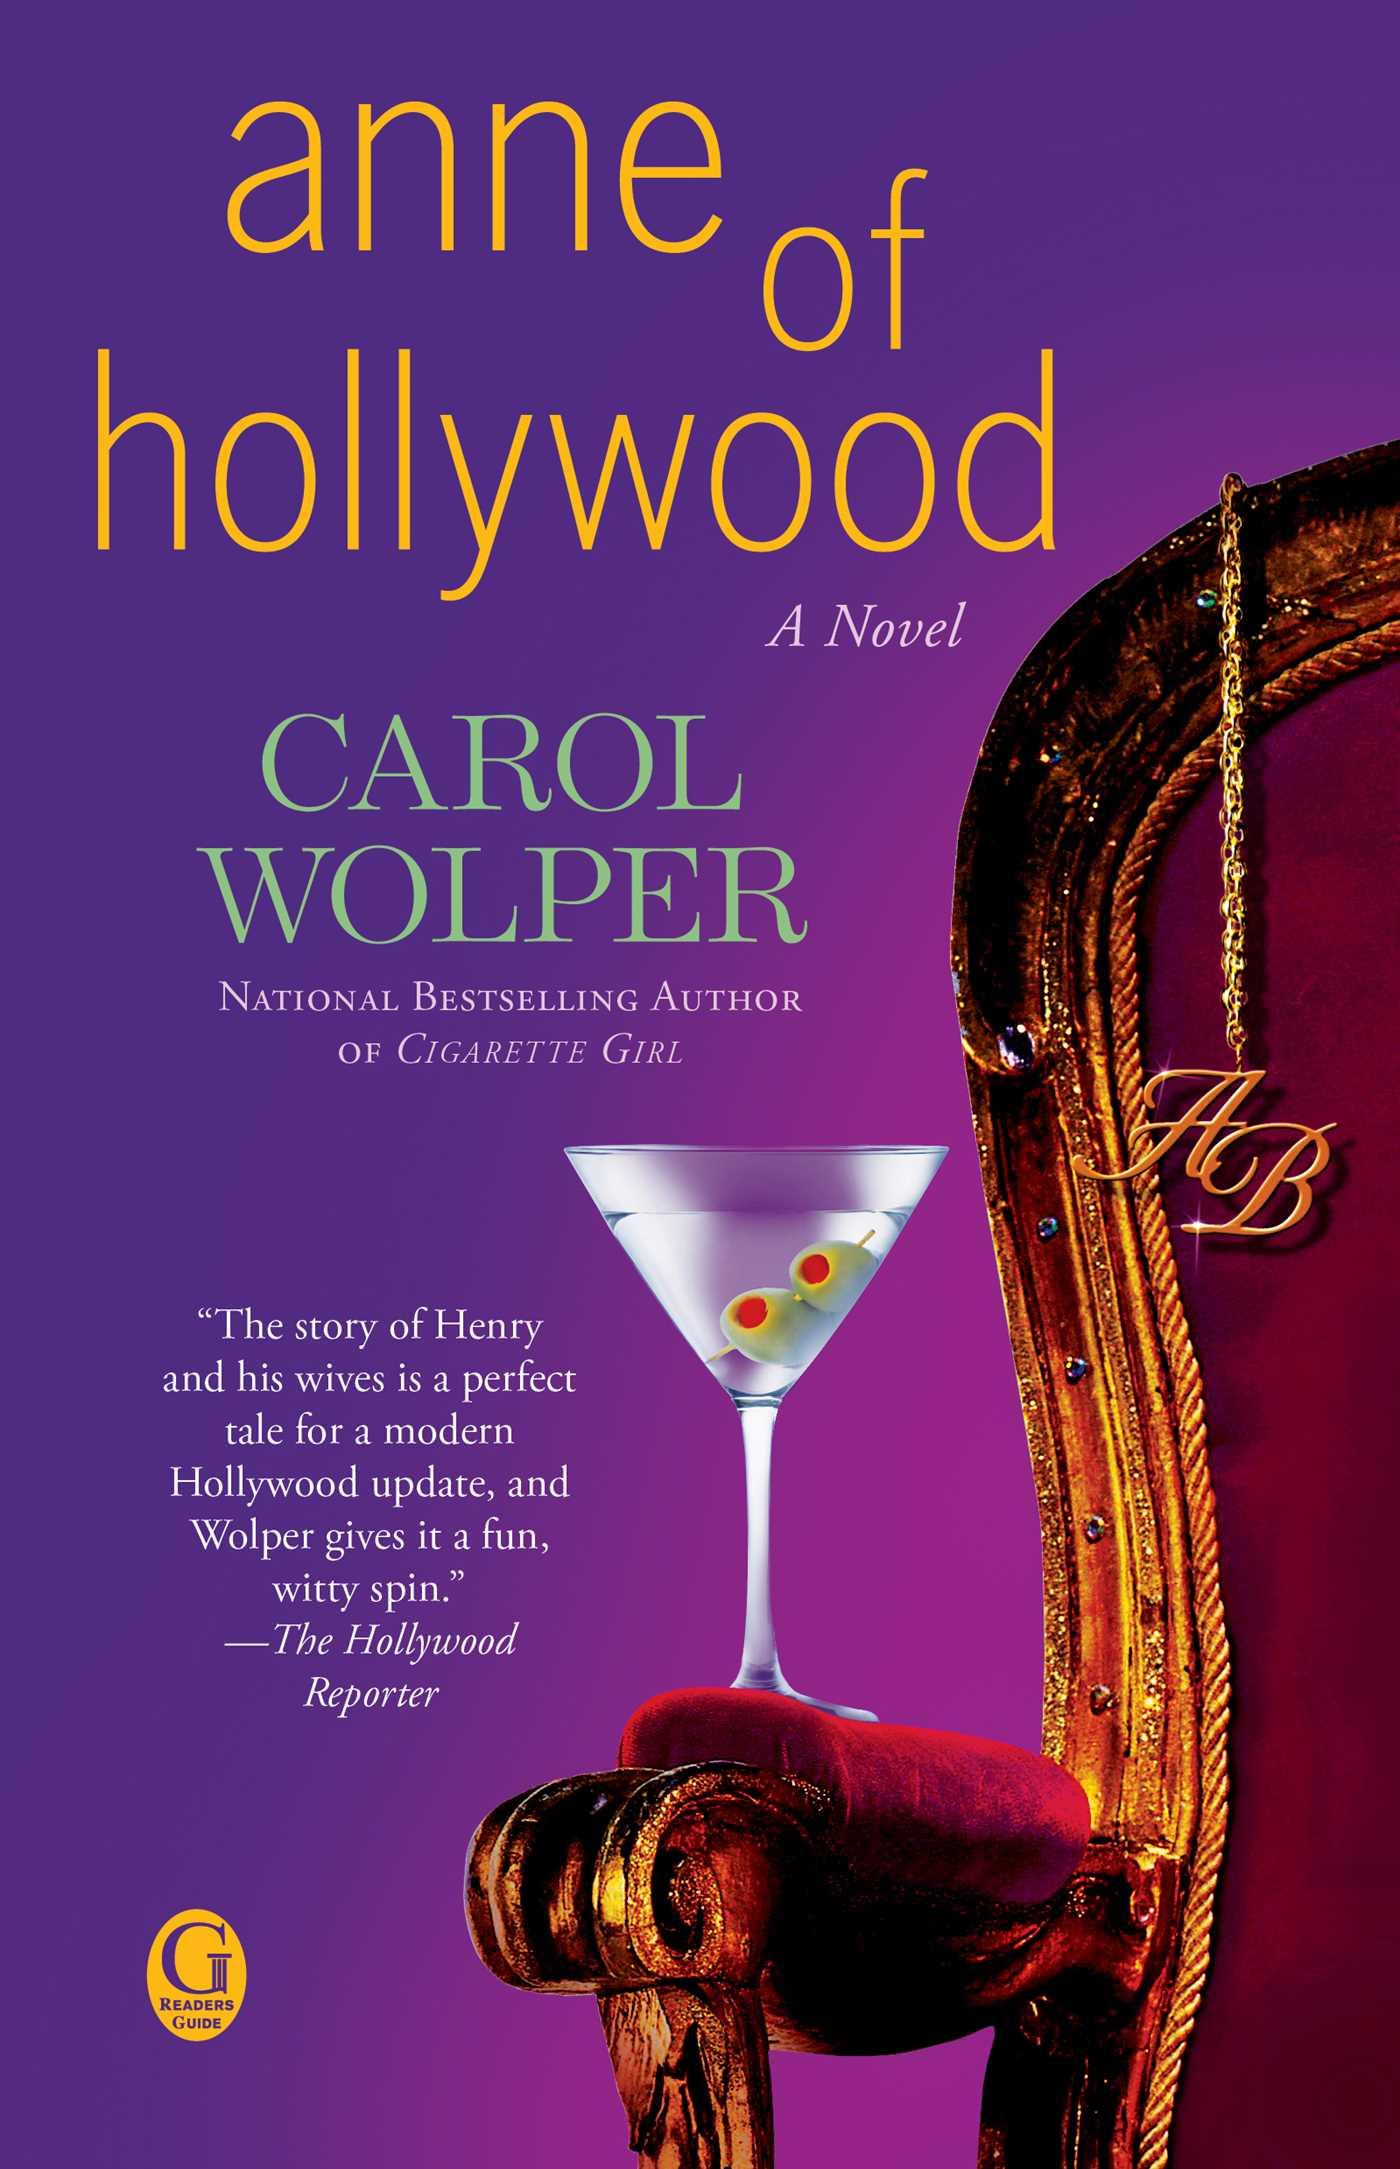 Anne of Hollywood eBook by Carol Wolper | Official ...